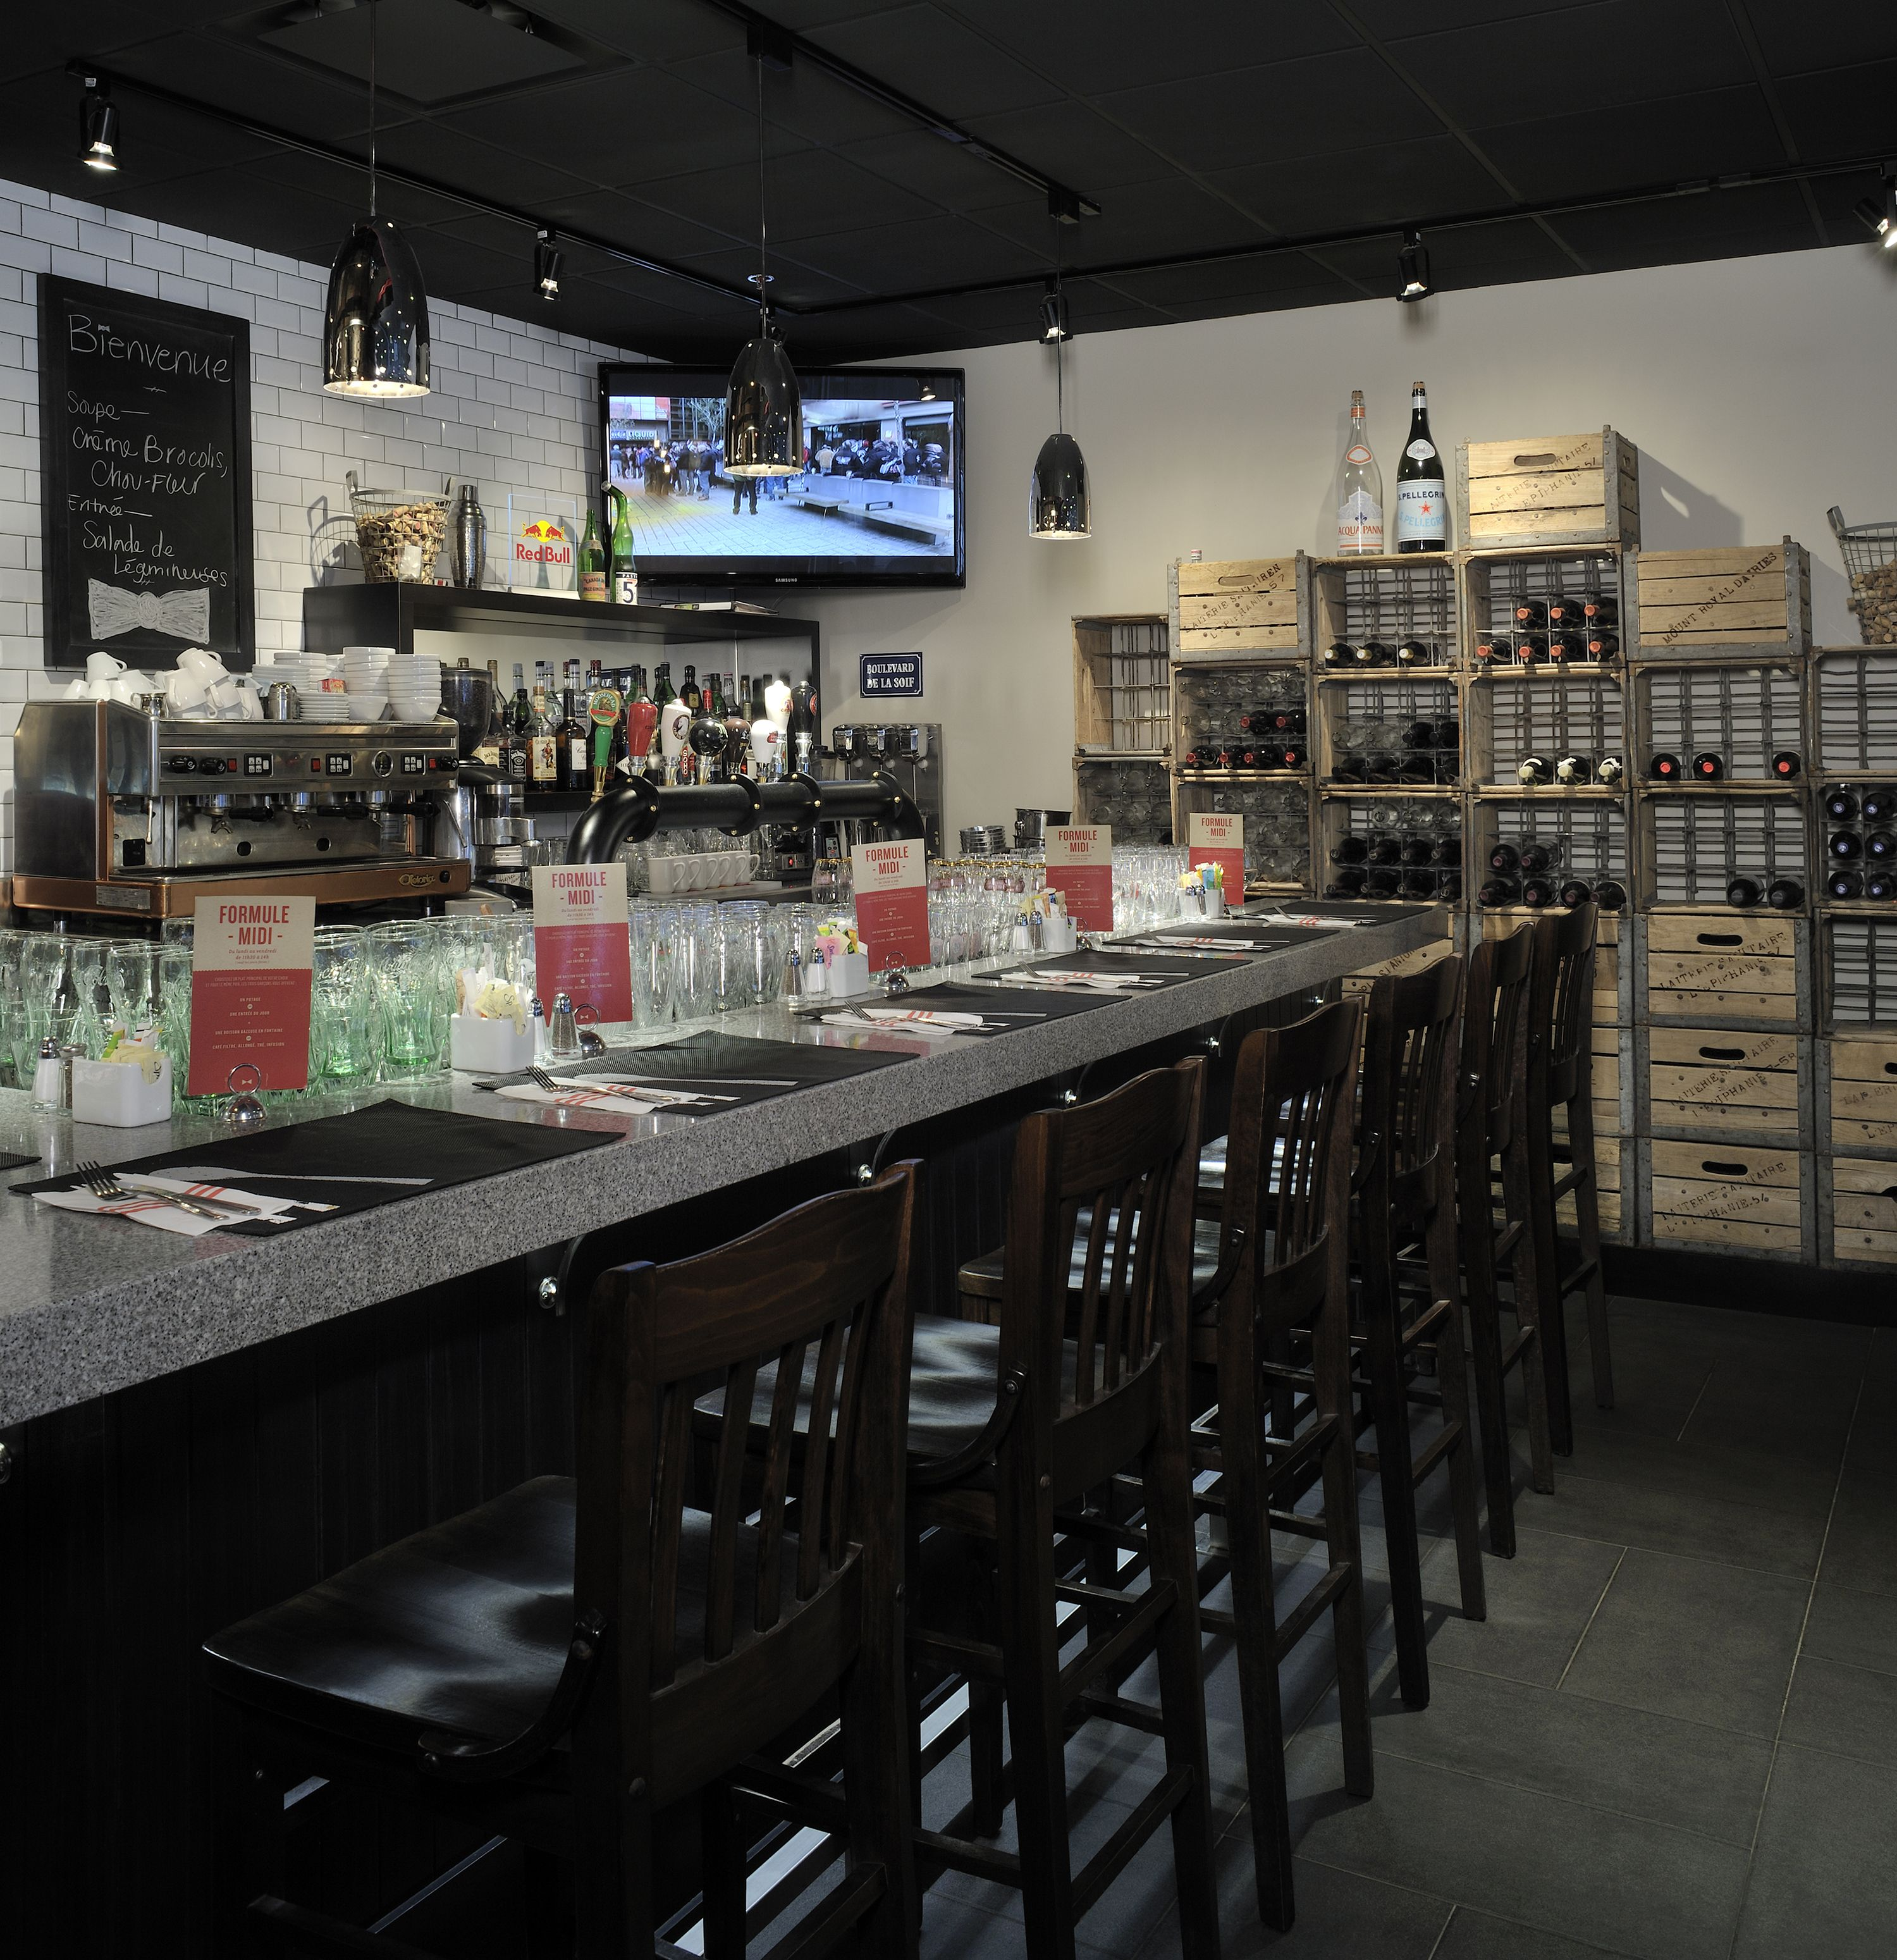 Lemaymichaud 3 Garcons Quebec Architecture Design Restaurant Eatery Hospitality Bar Bottles Wine Ce Architecture Design Design Architecture